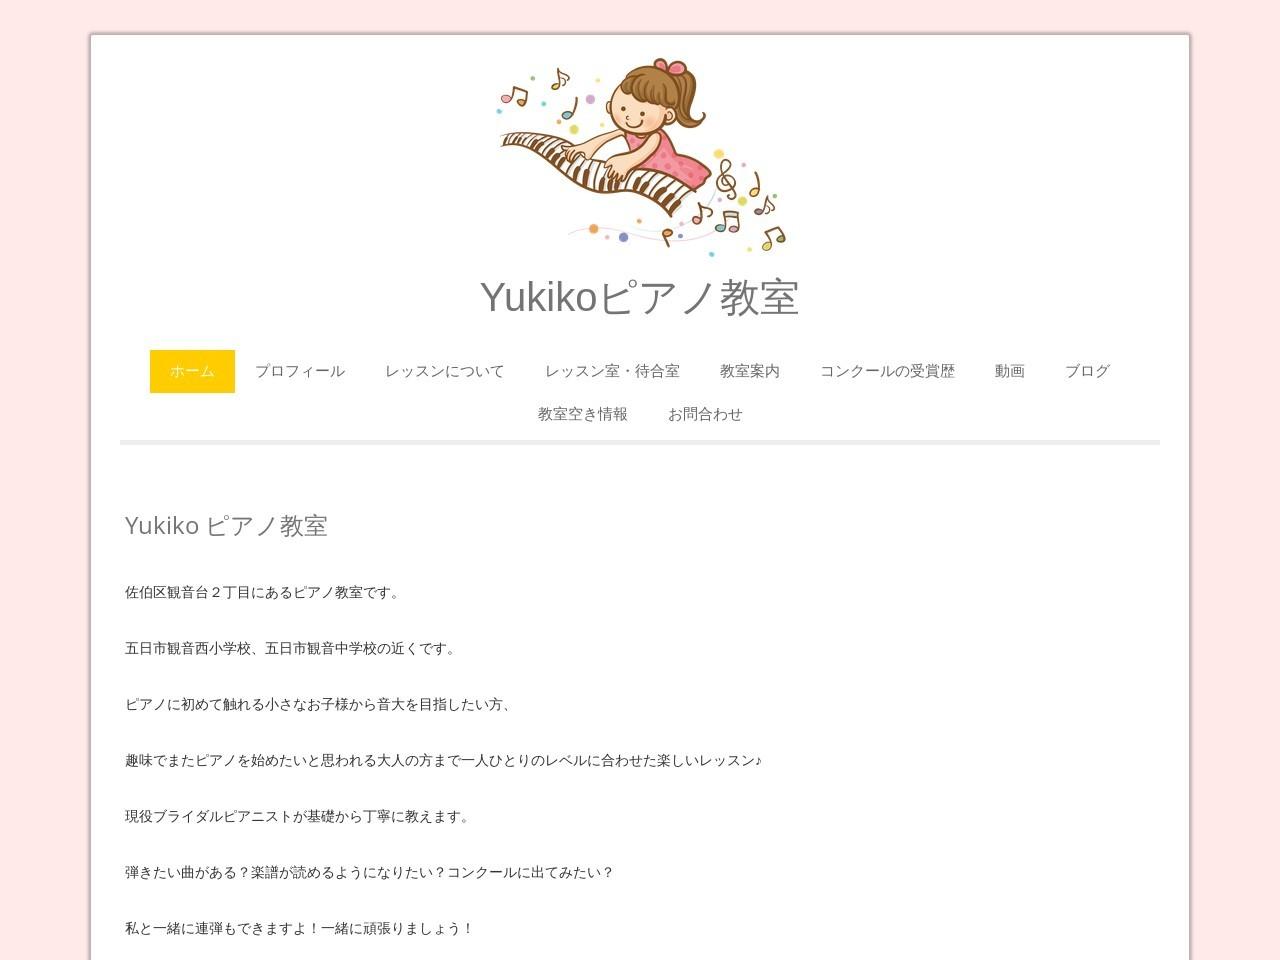 Yukikoピアノ教室のサムネイル